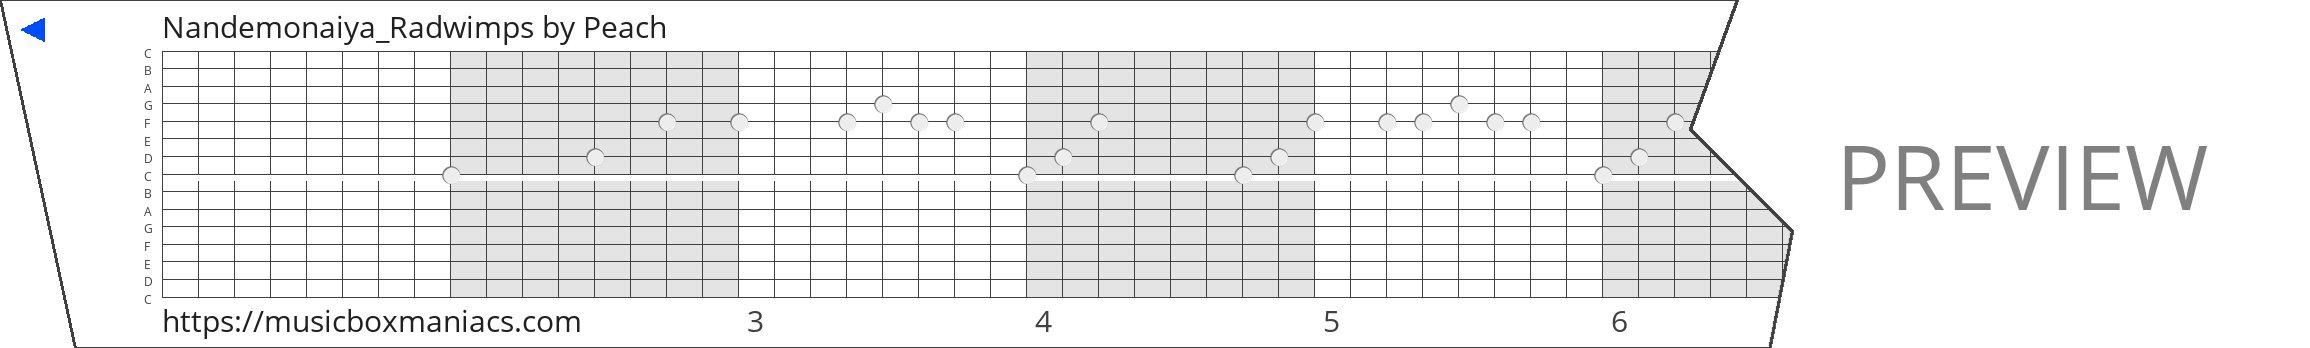 Nandemonaiya_Radwimps 15 note music box paper strip